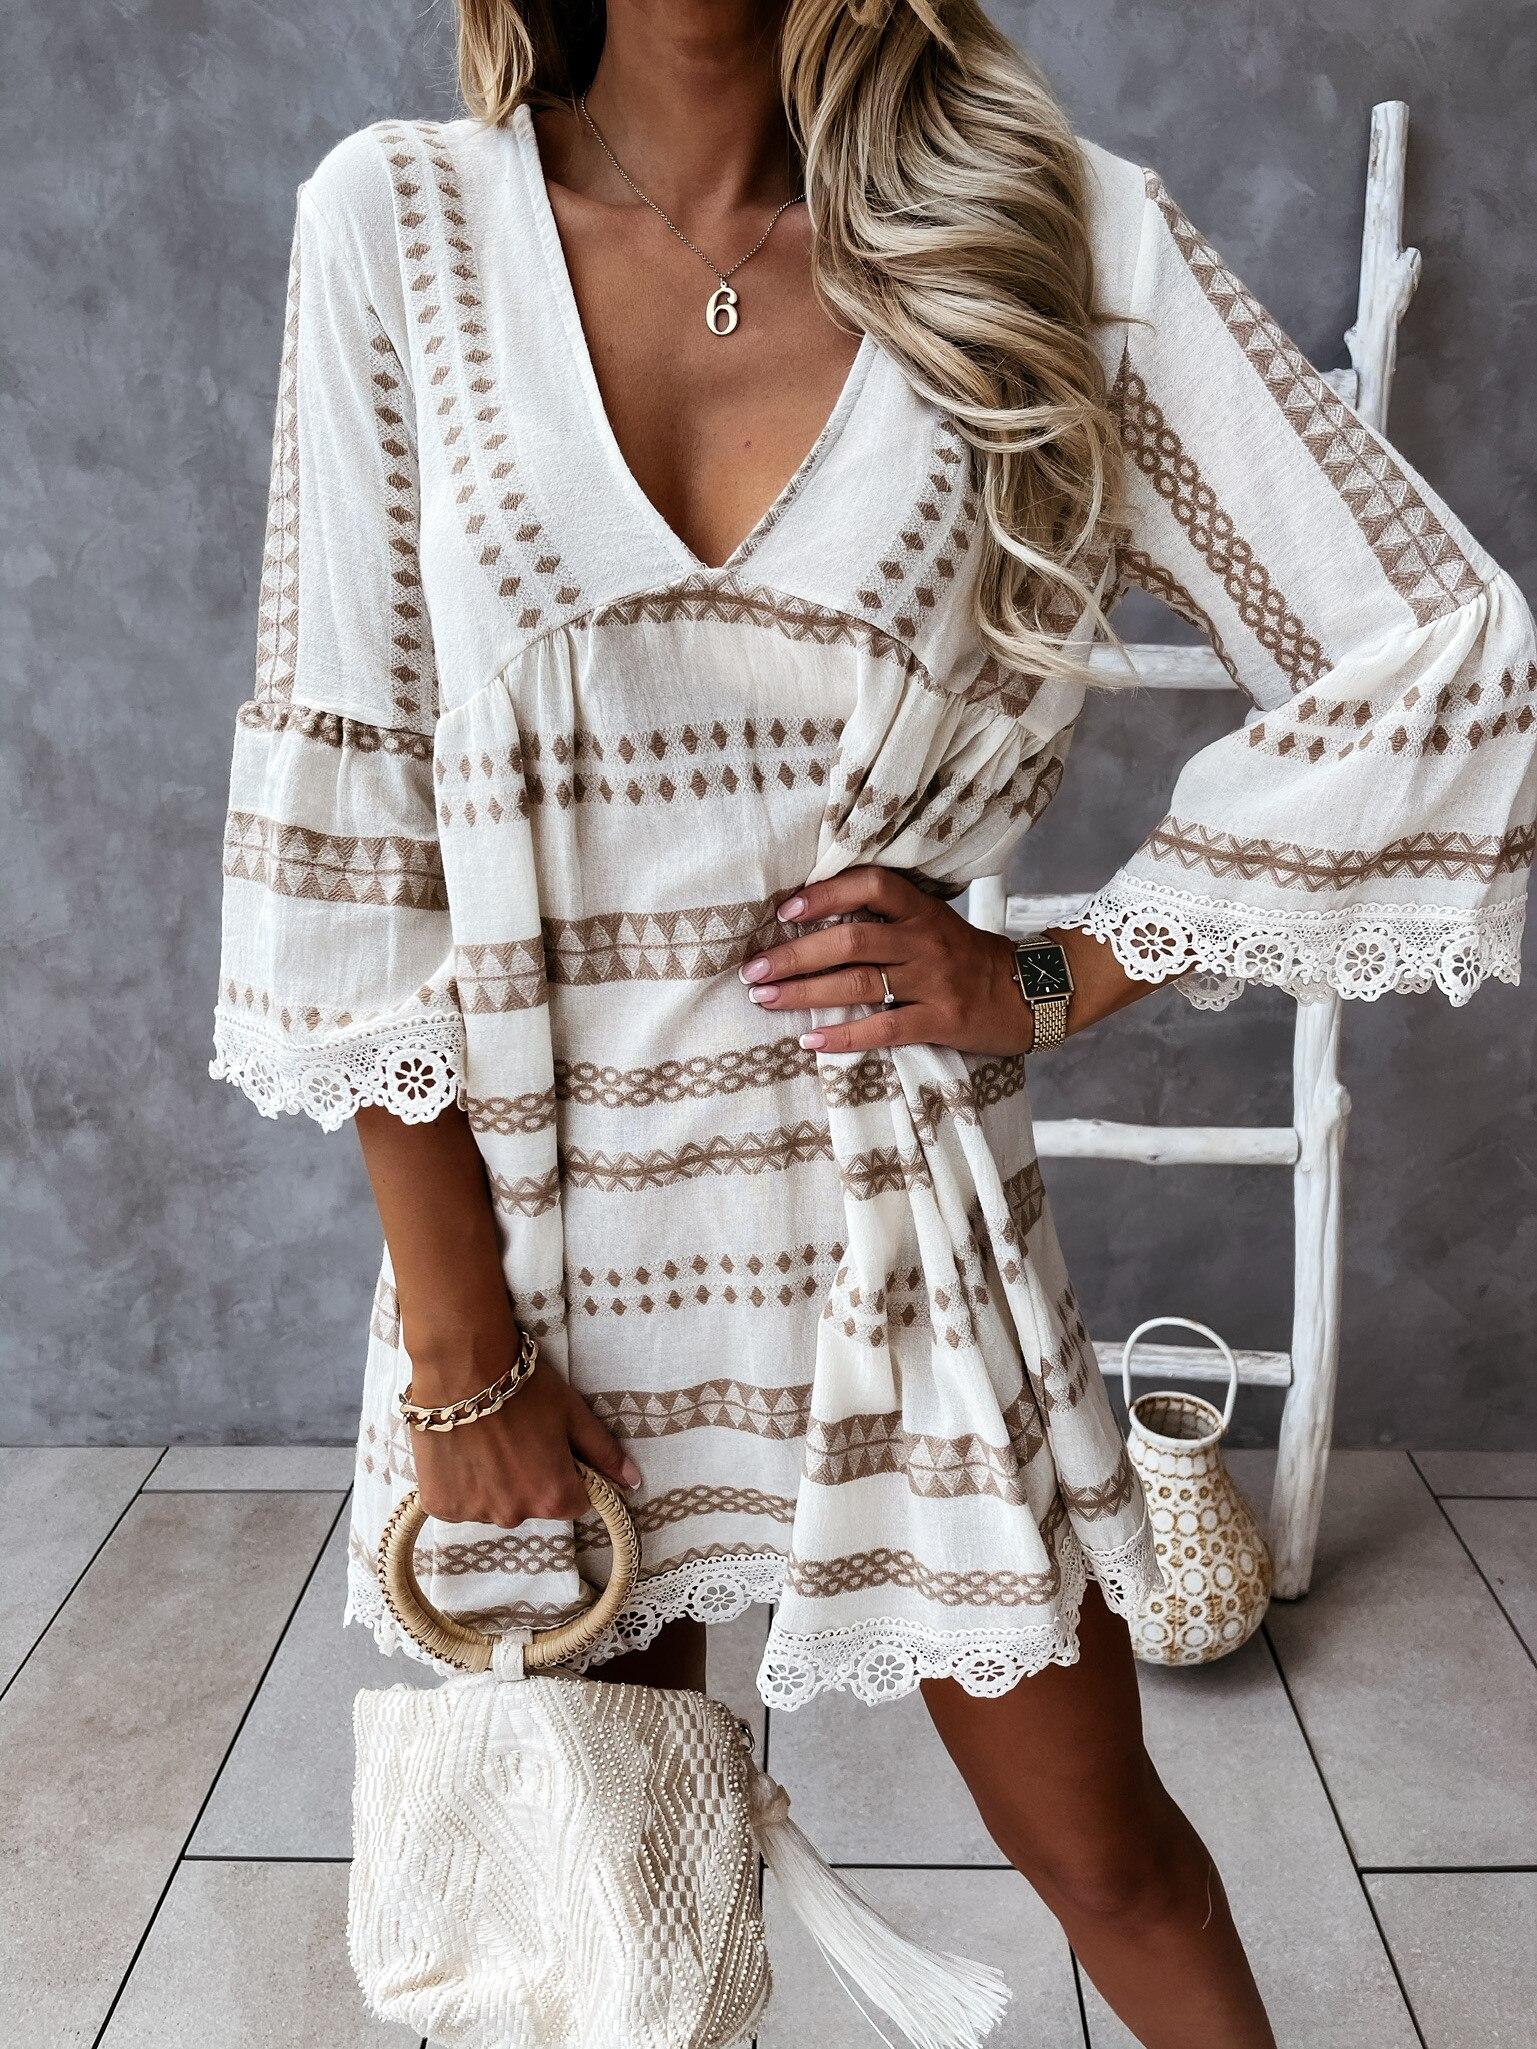 2021 New Summer Lace Dress Women V Neck Long Sleeve Party Vestidos Ladies Fashion Dresses